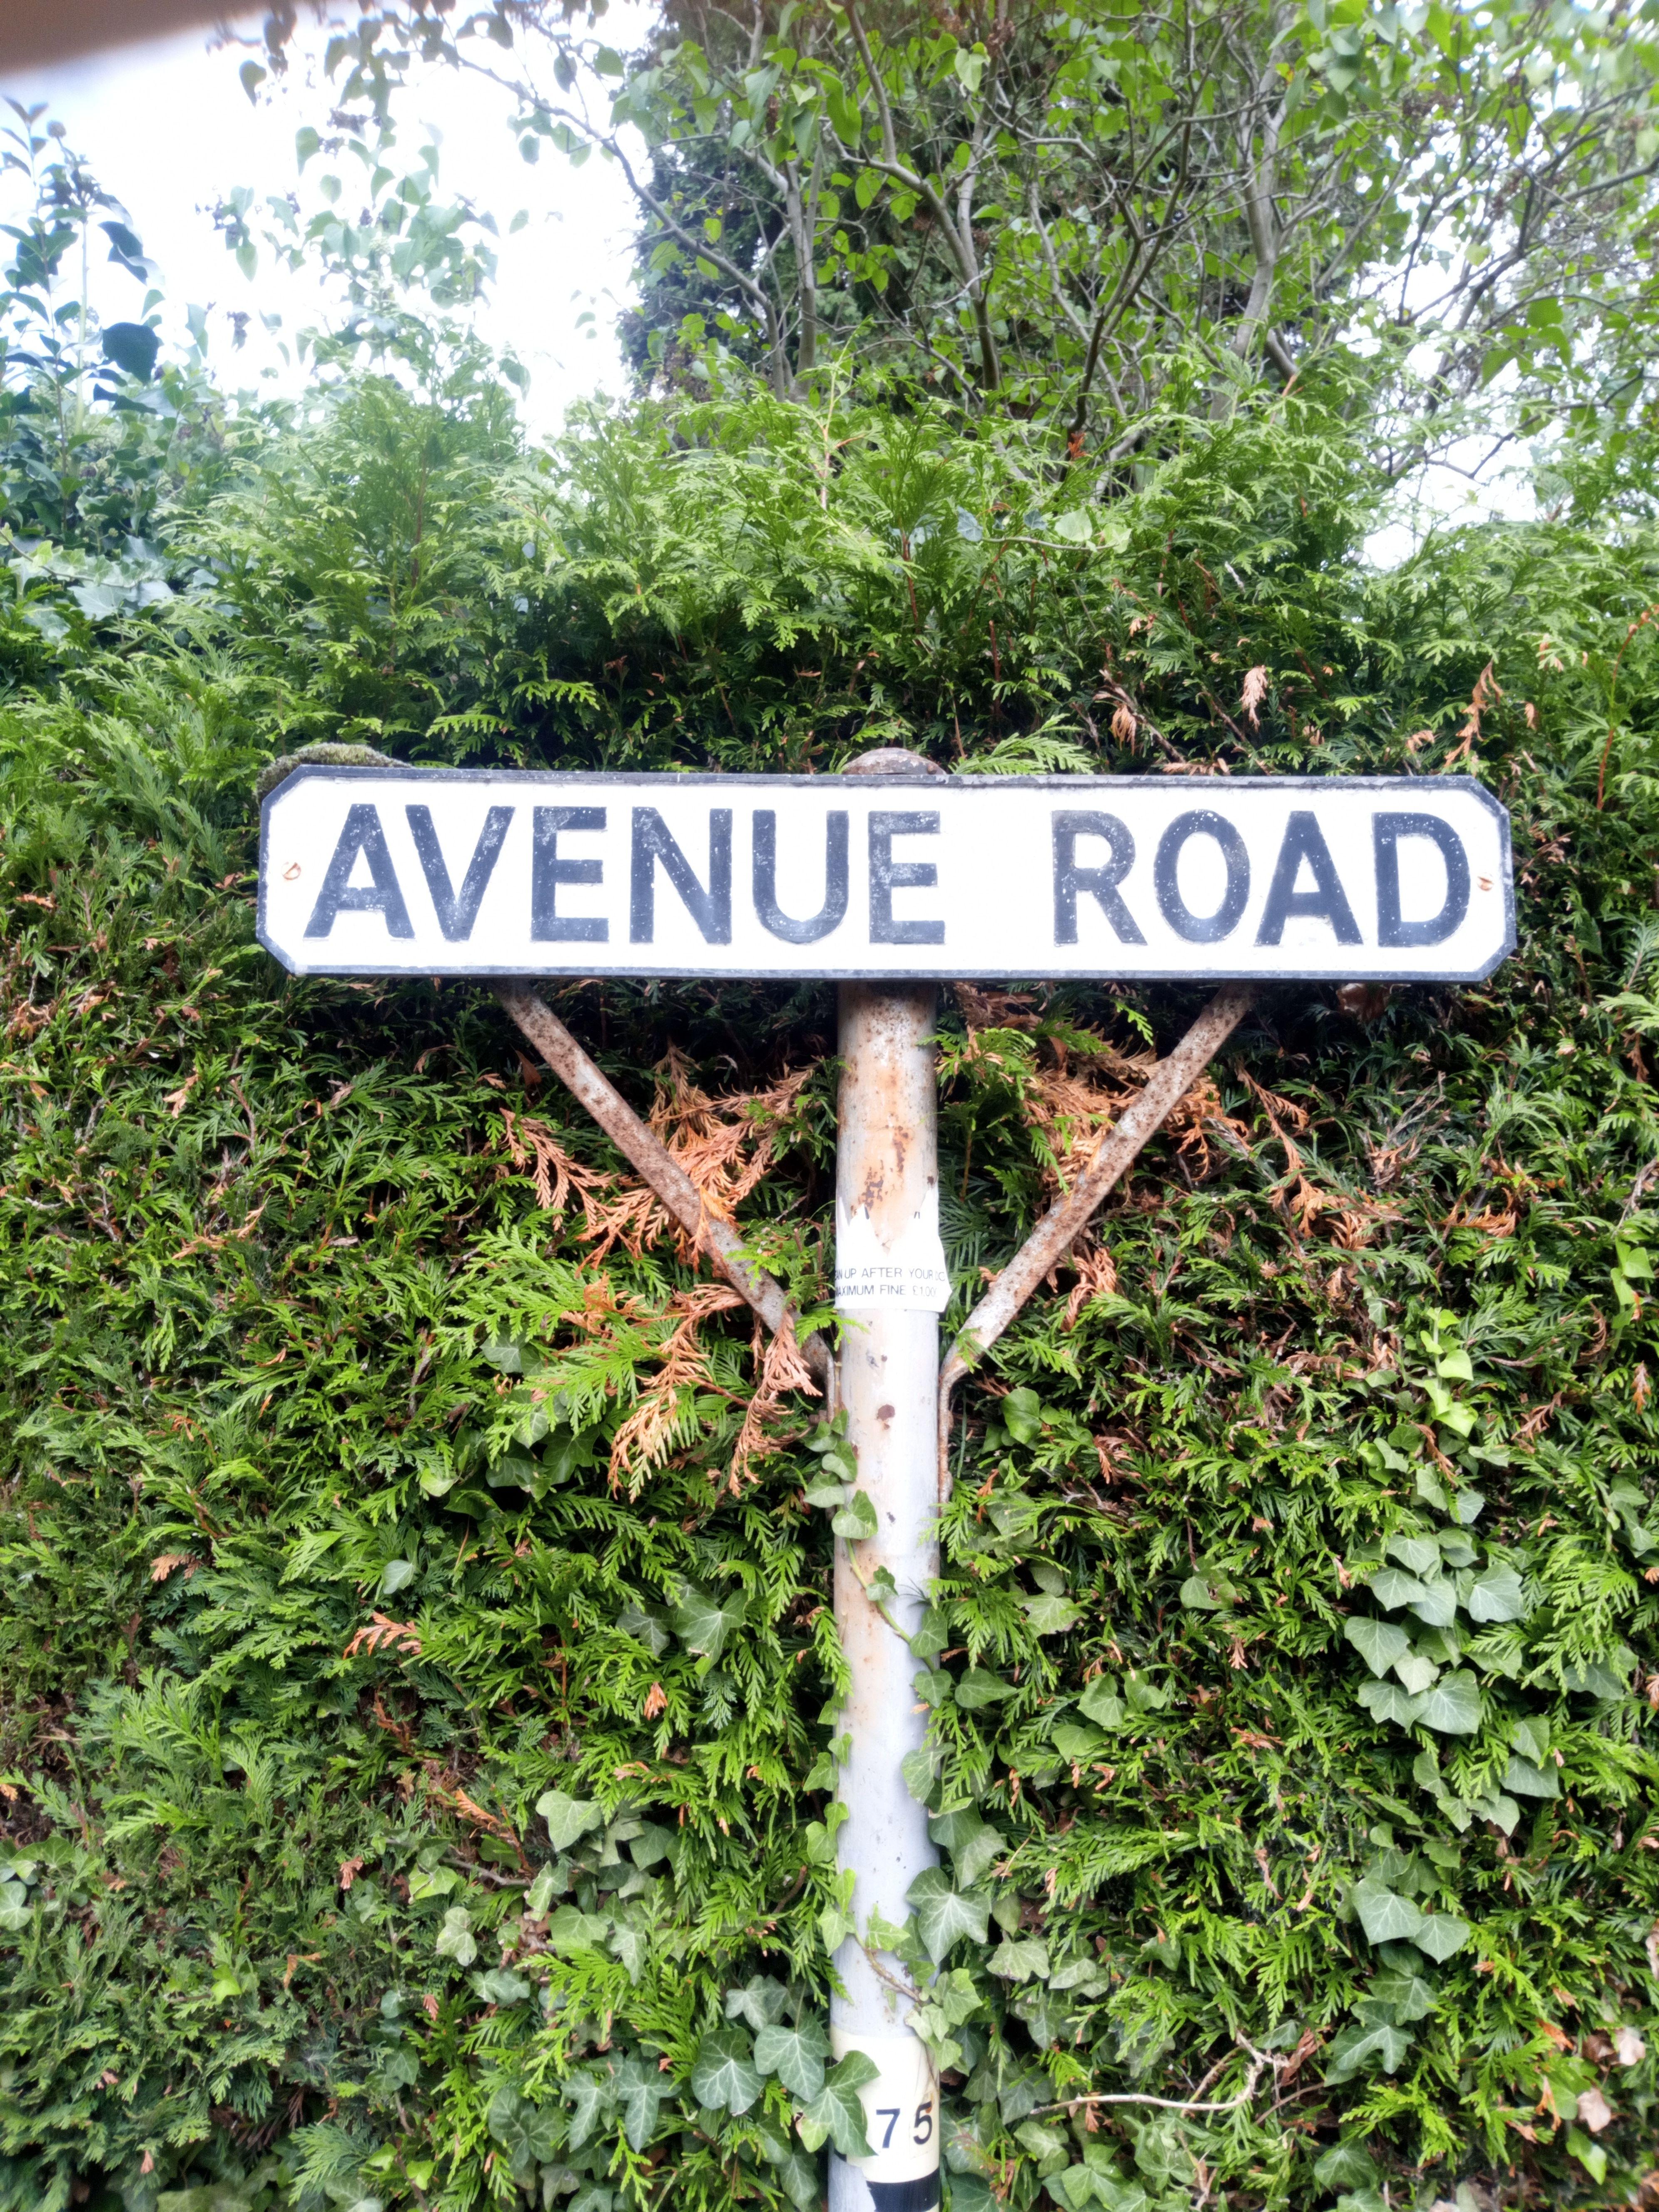 Avenue Road Thoroughfare Type + Thoroughfare Type in